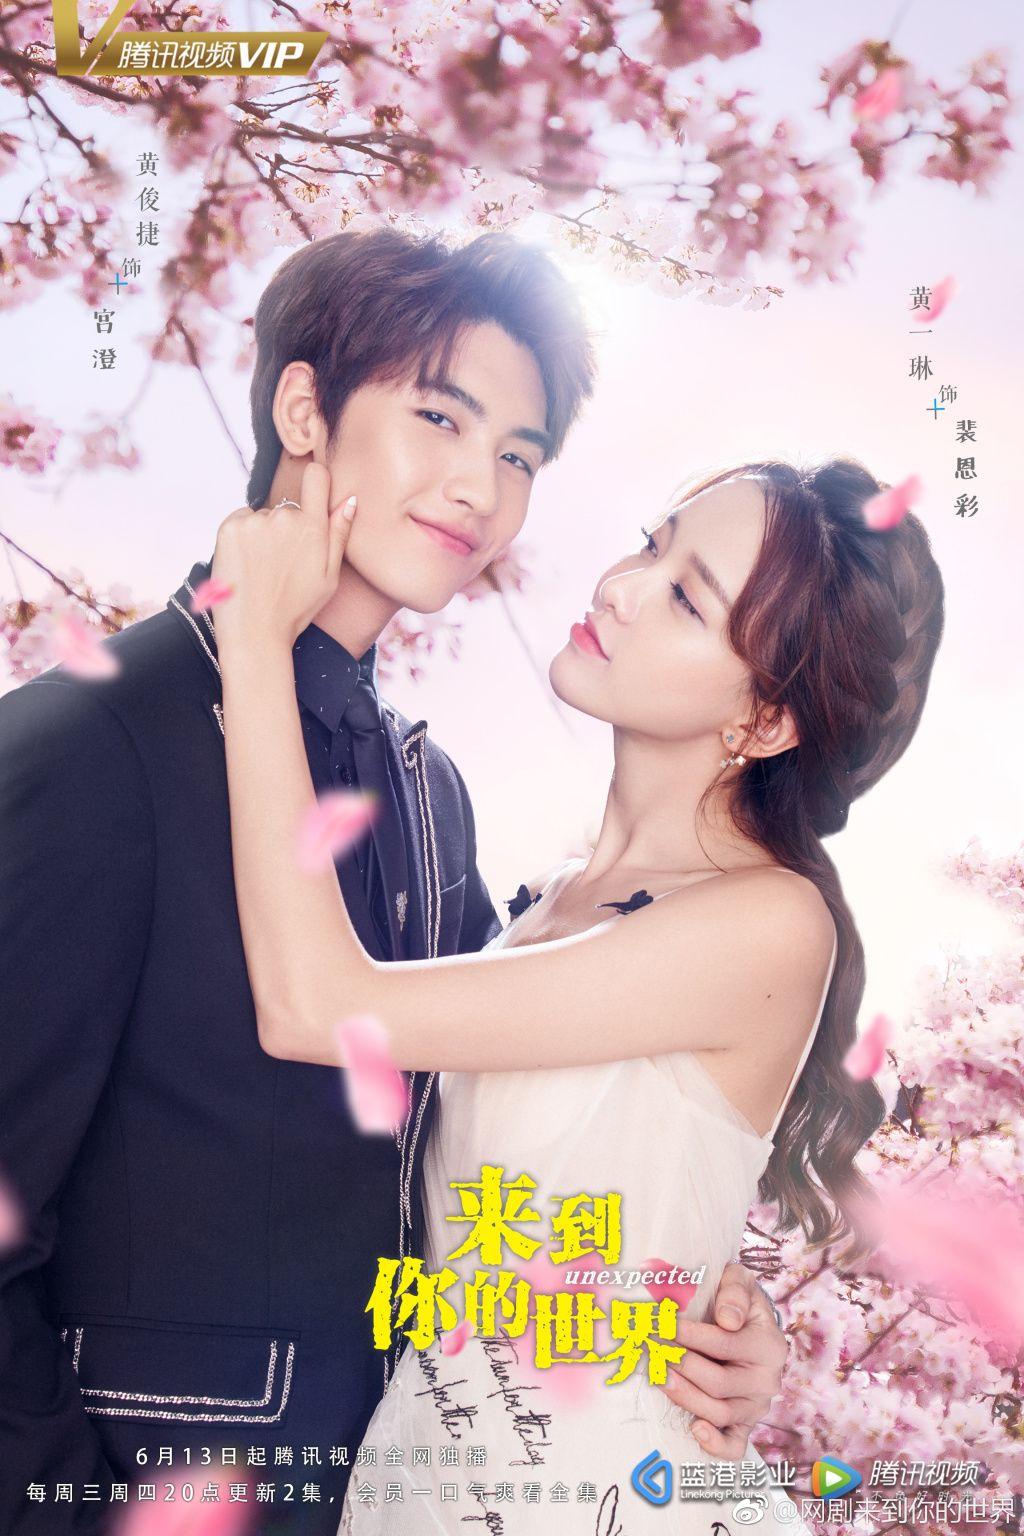 Unexpected 2018 Genres Romance Fantasy Chinesedrama Chinese HuangJunJie